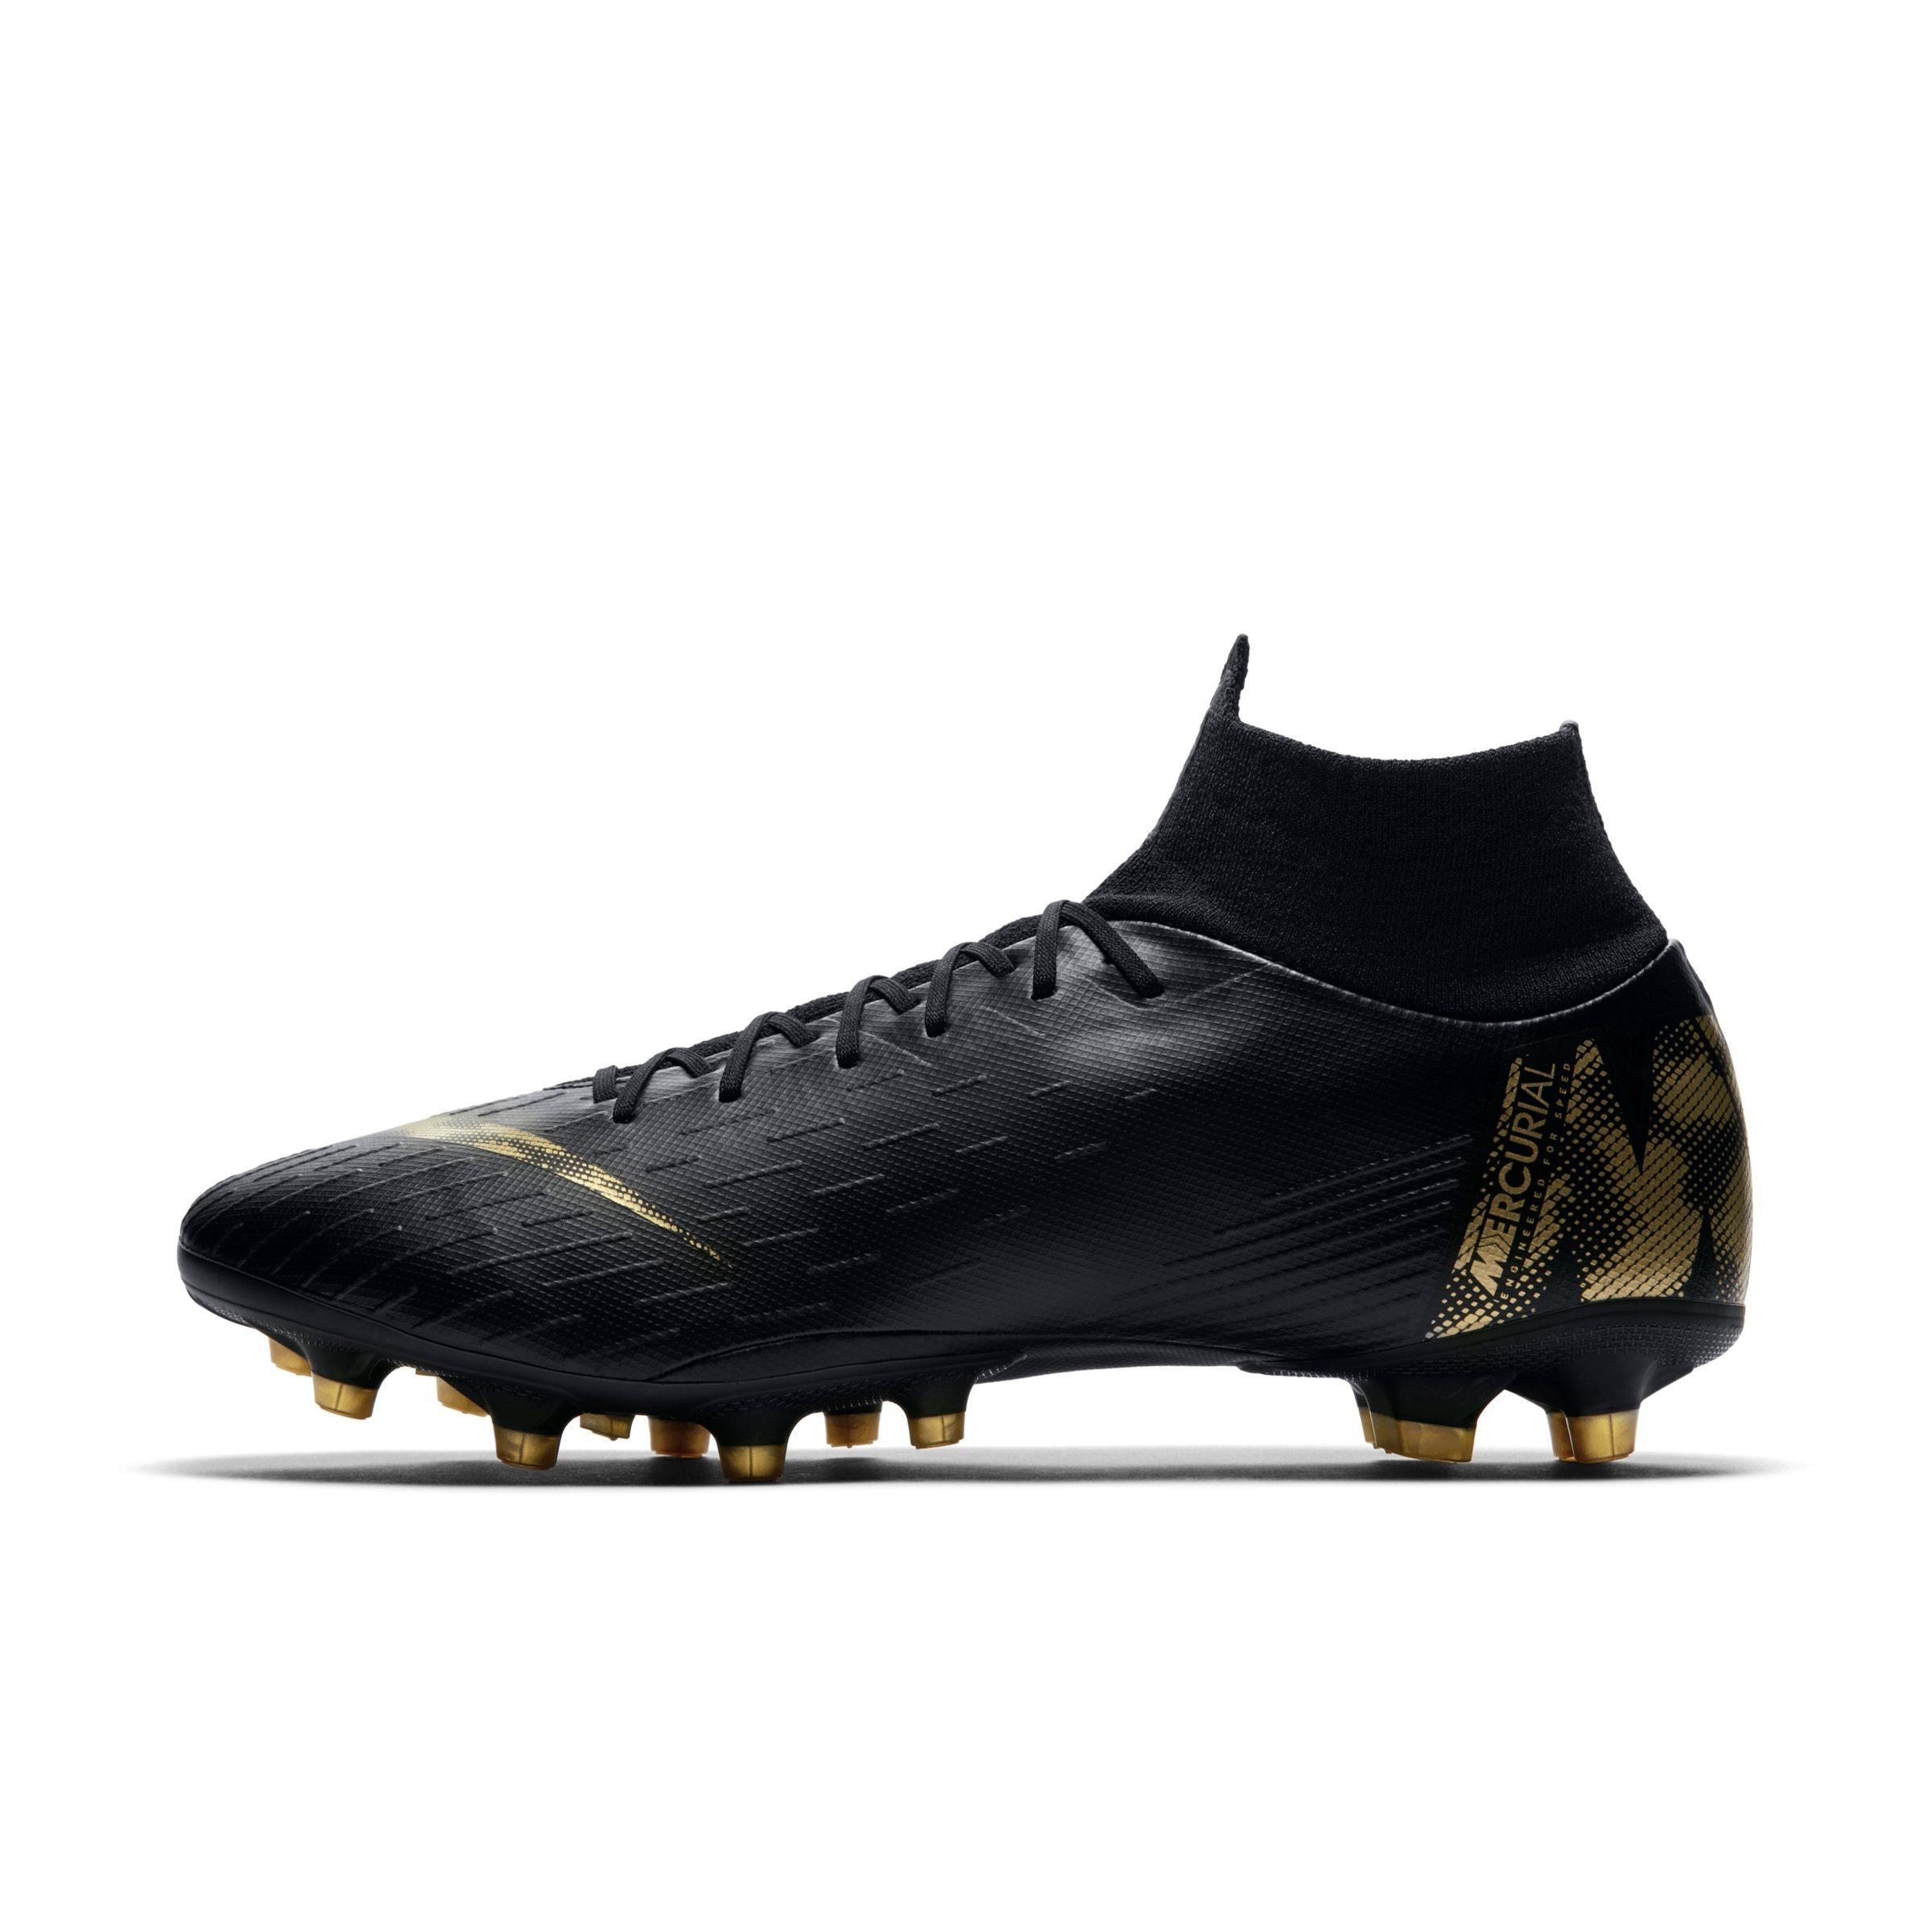 b7fea6115d8 Nike. Women s Black Mercurial Superfly Vi Pro Ag-pro Artificial-grass  Football Boot